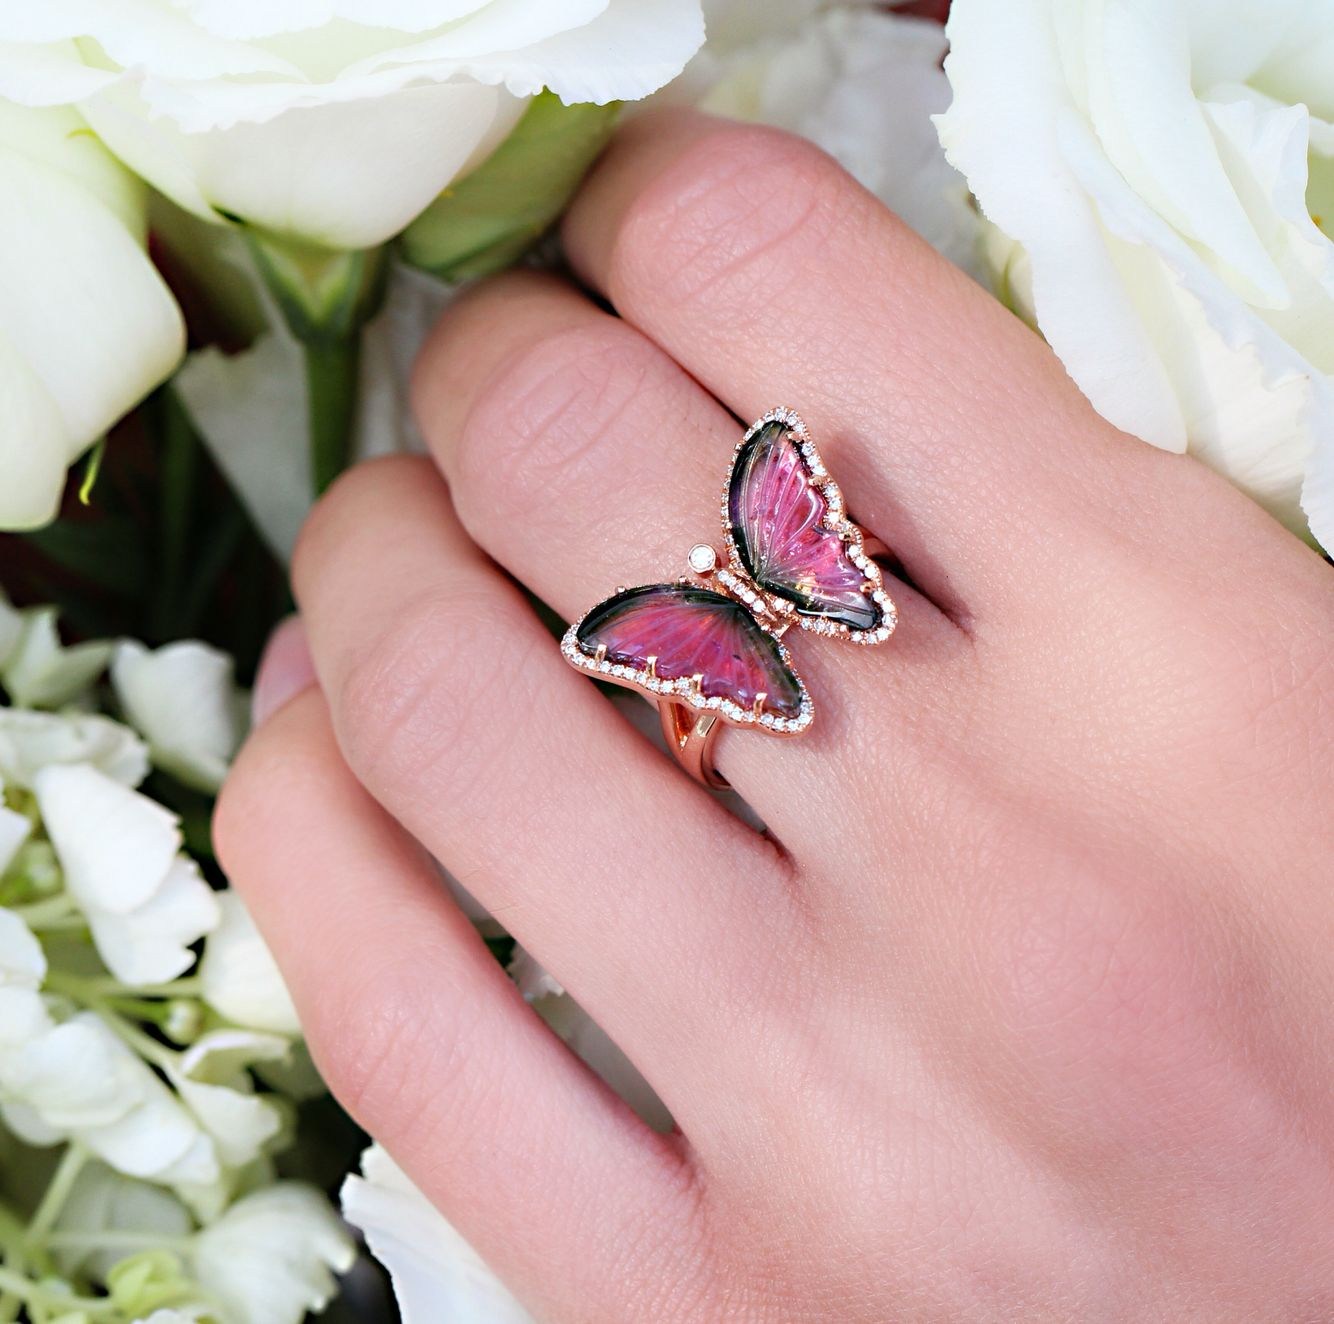 Pin by Luna Skye on LUNA SKYE JEWELS | Pinterest | Pink tourmaline ...